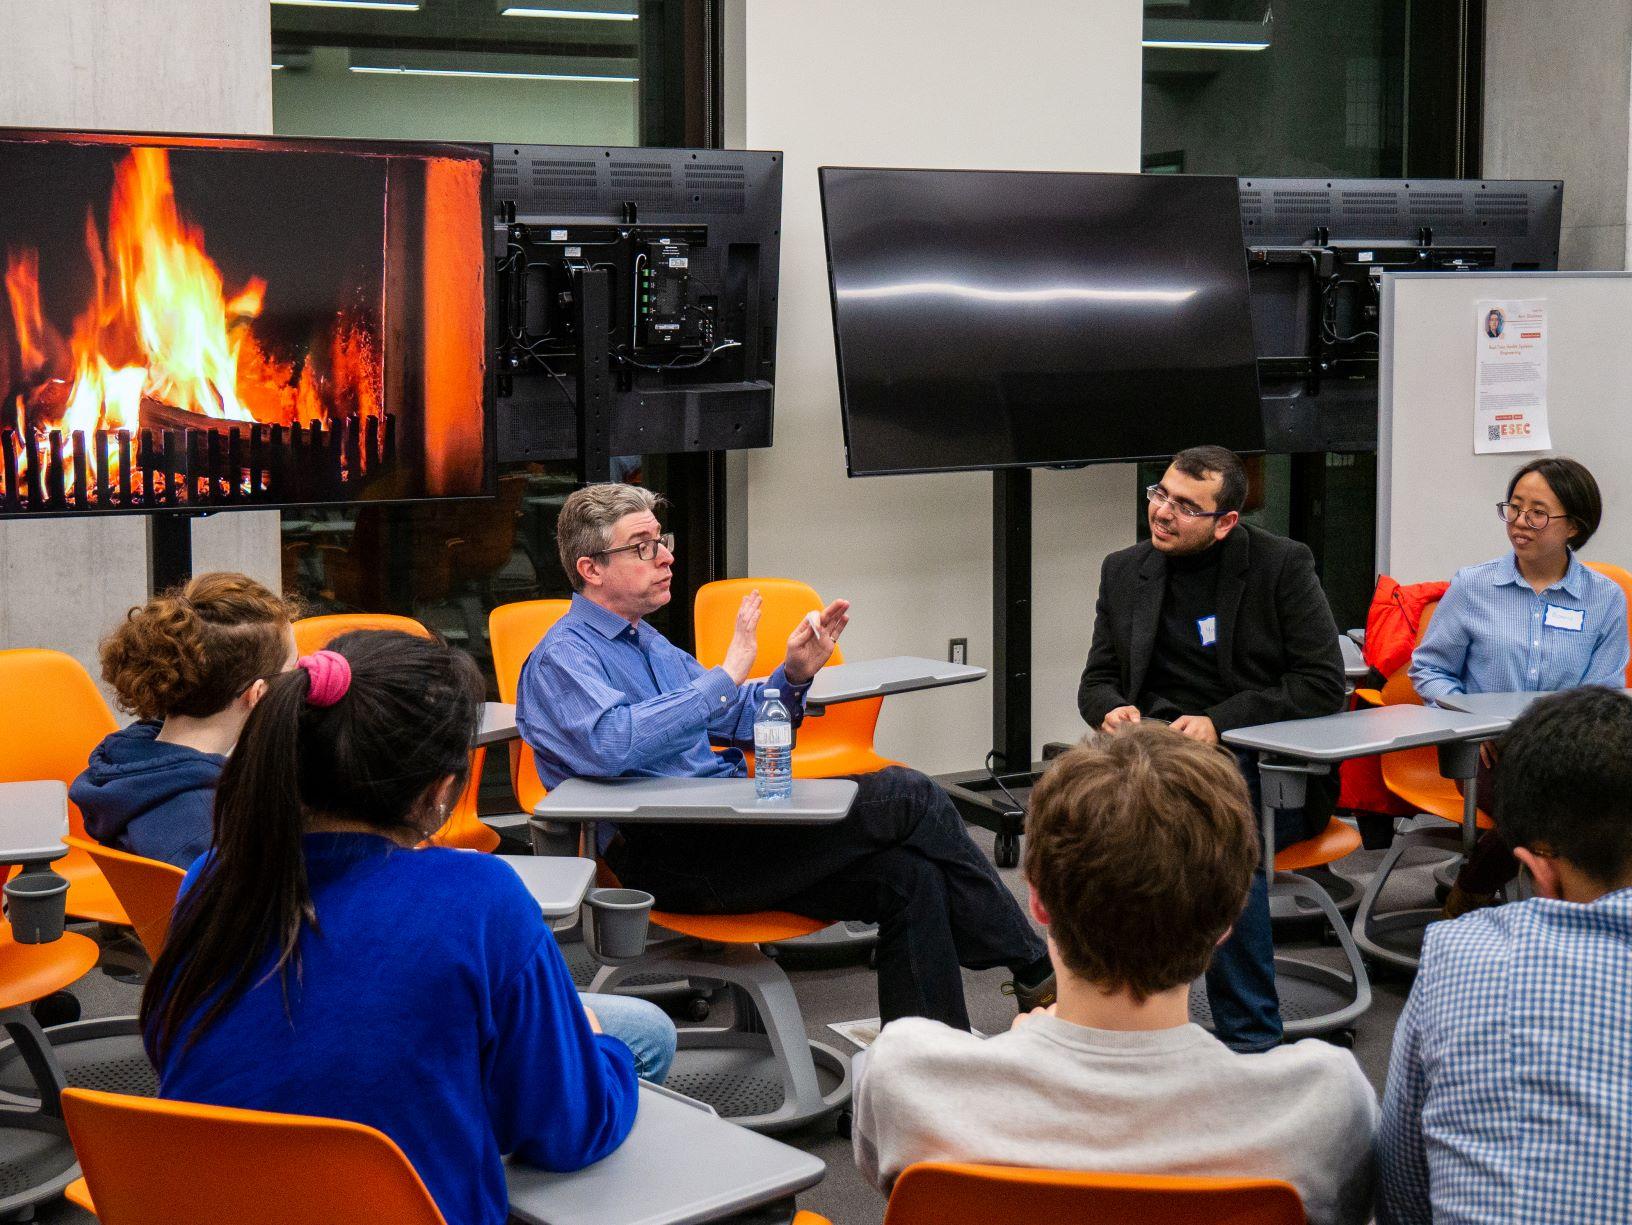 ESEC 2020 Fireside Chats